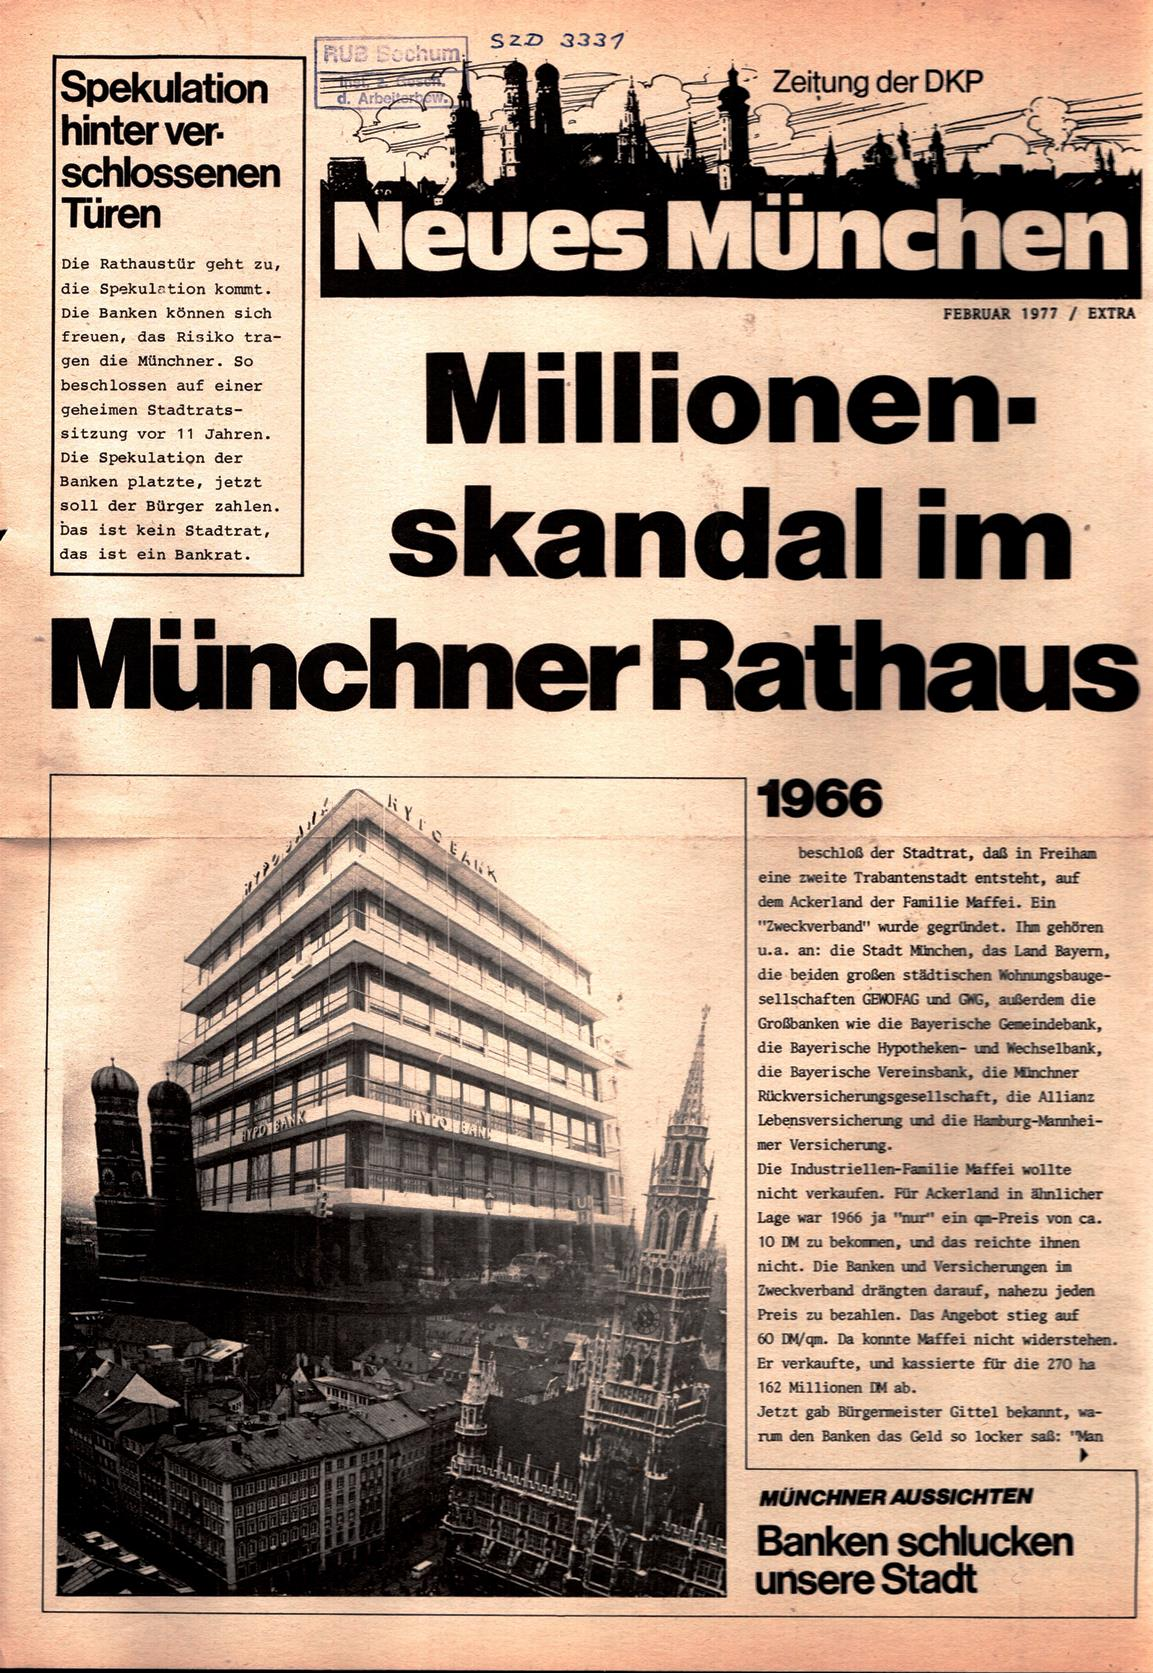 Muenchen_DKP_Neues_Muenchen_19770200_Extra_001